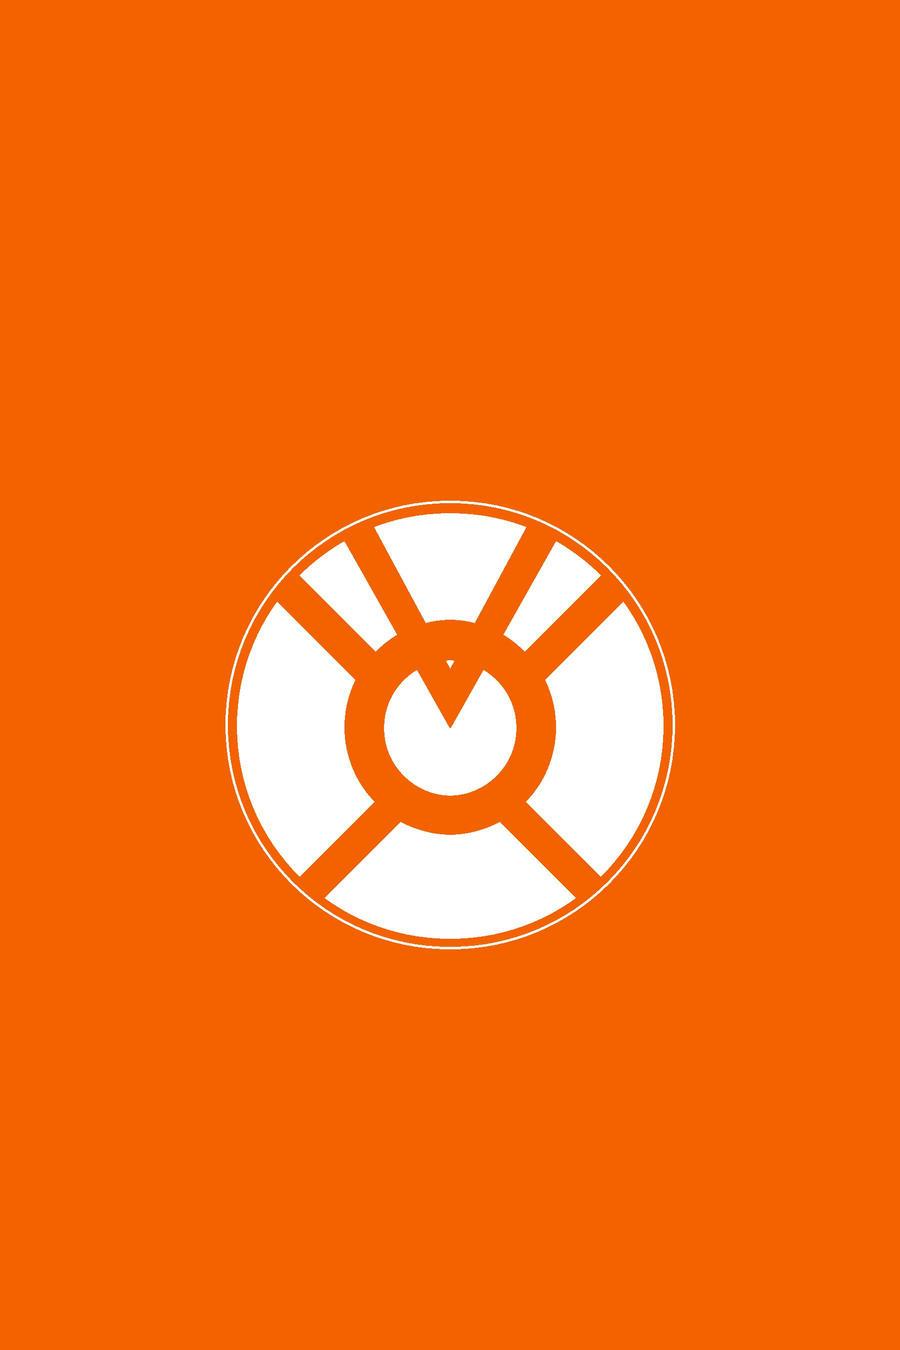 Orange Lantern Corps by portfan on deviantART